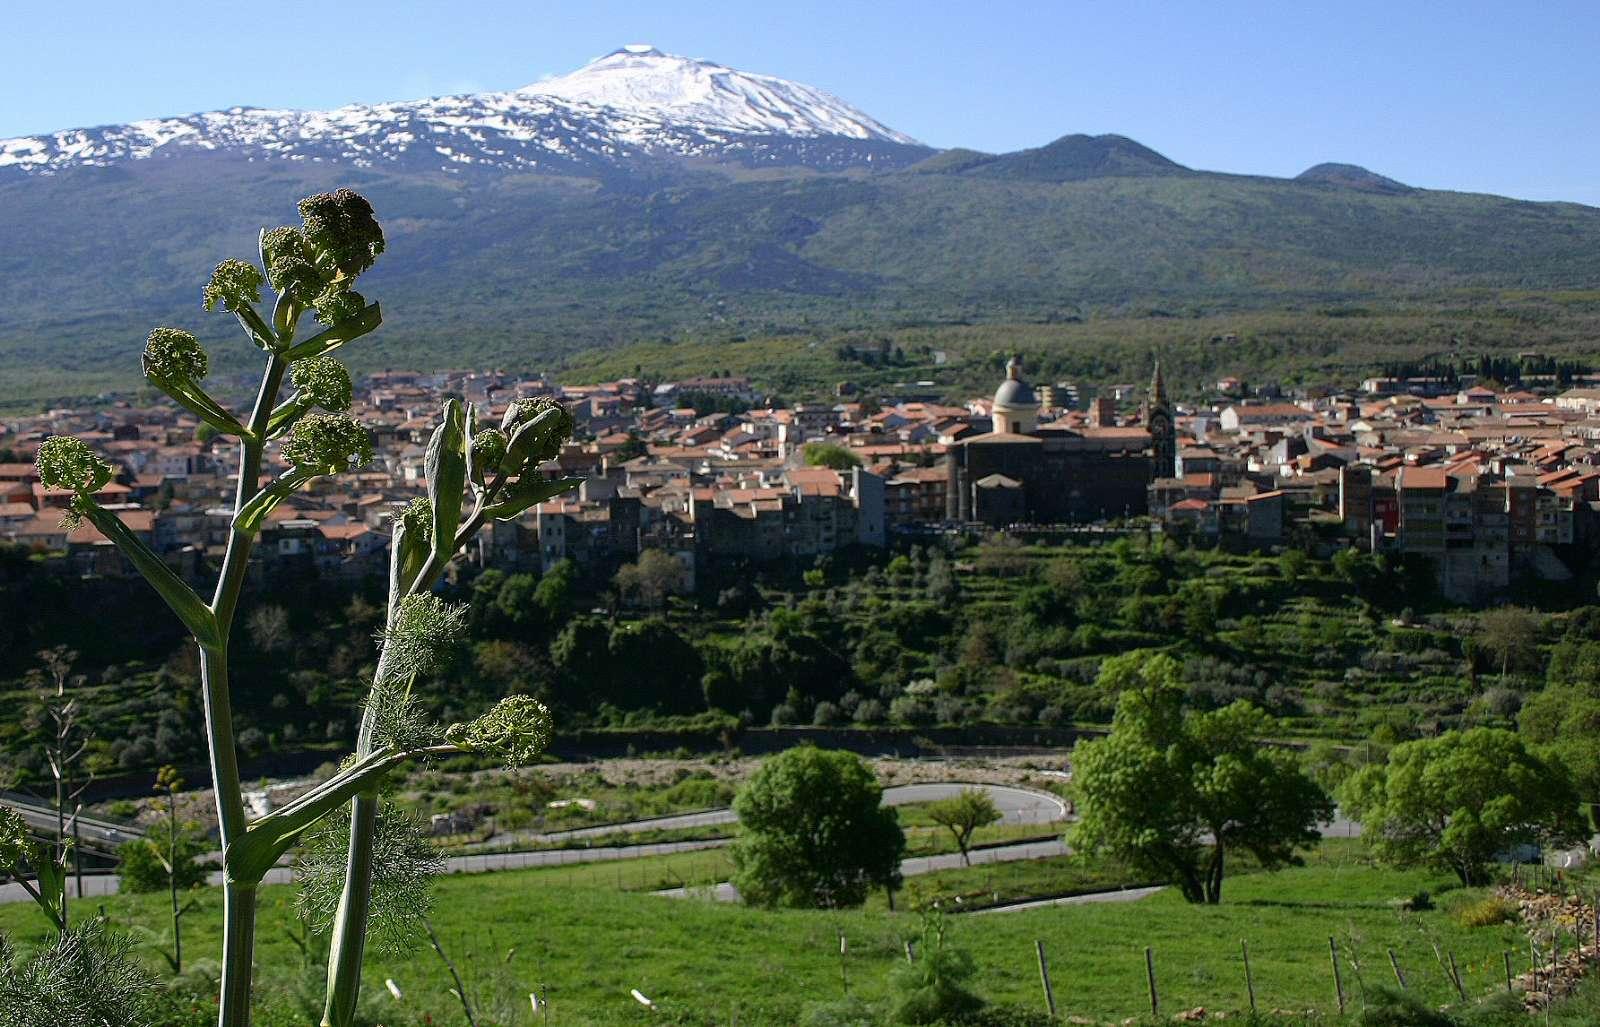 Randazzo med Etna i baggrunden